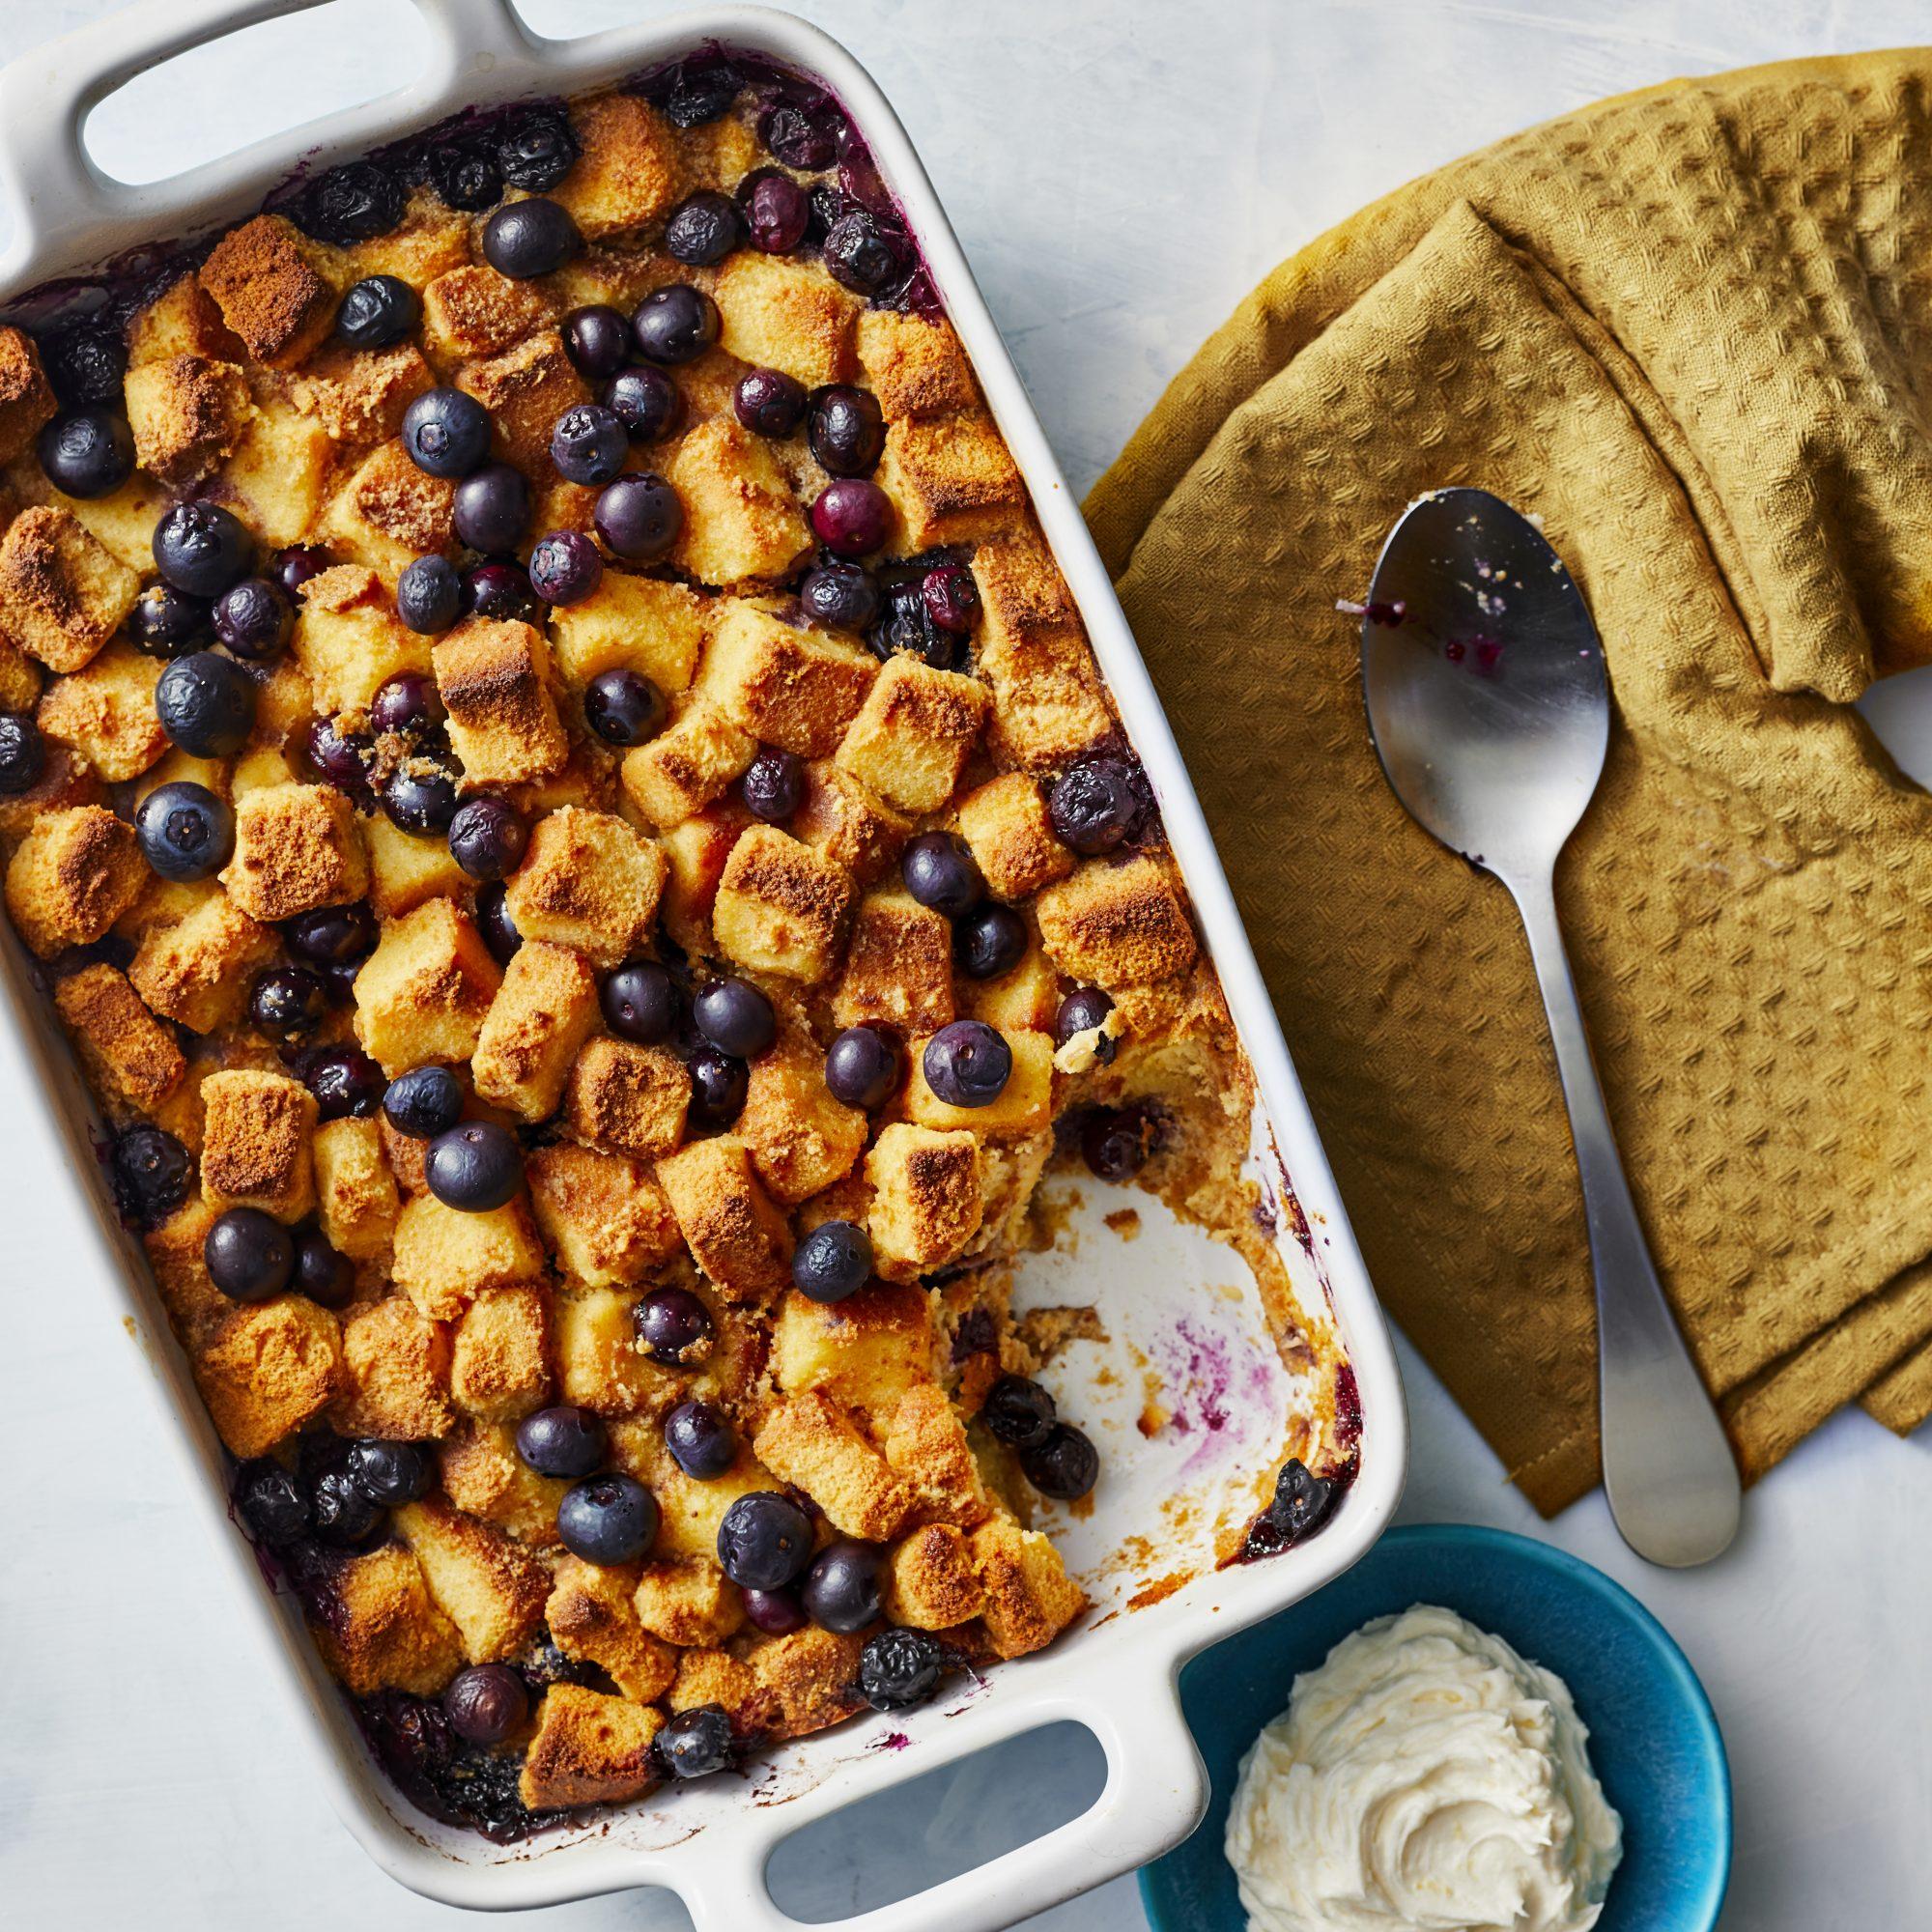 Blueberry Bread Pudding With Lemon Hard Sauce image